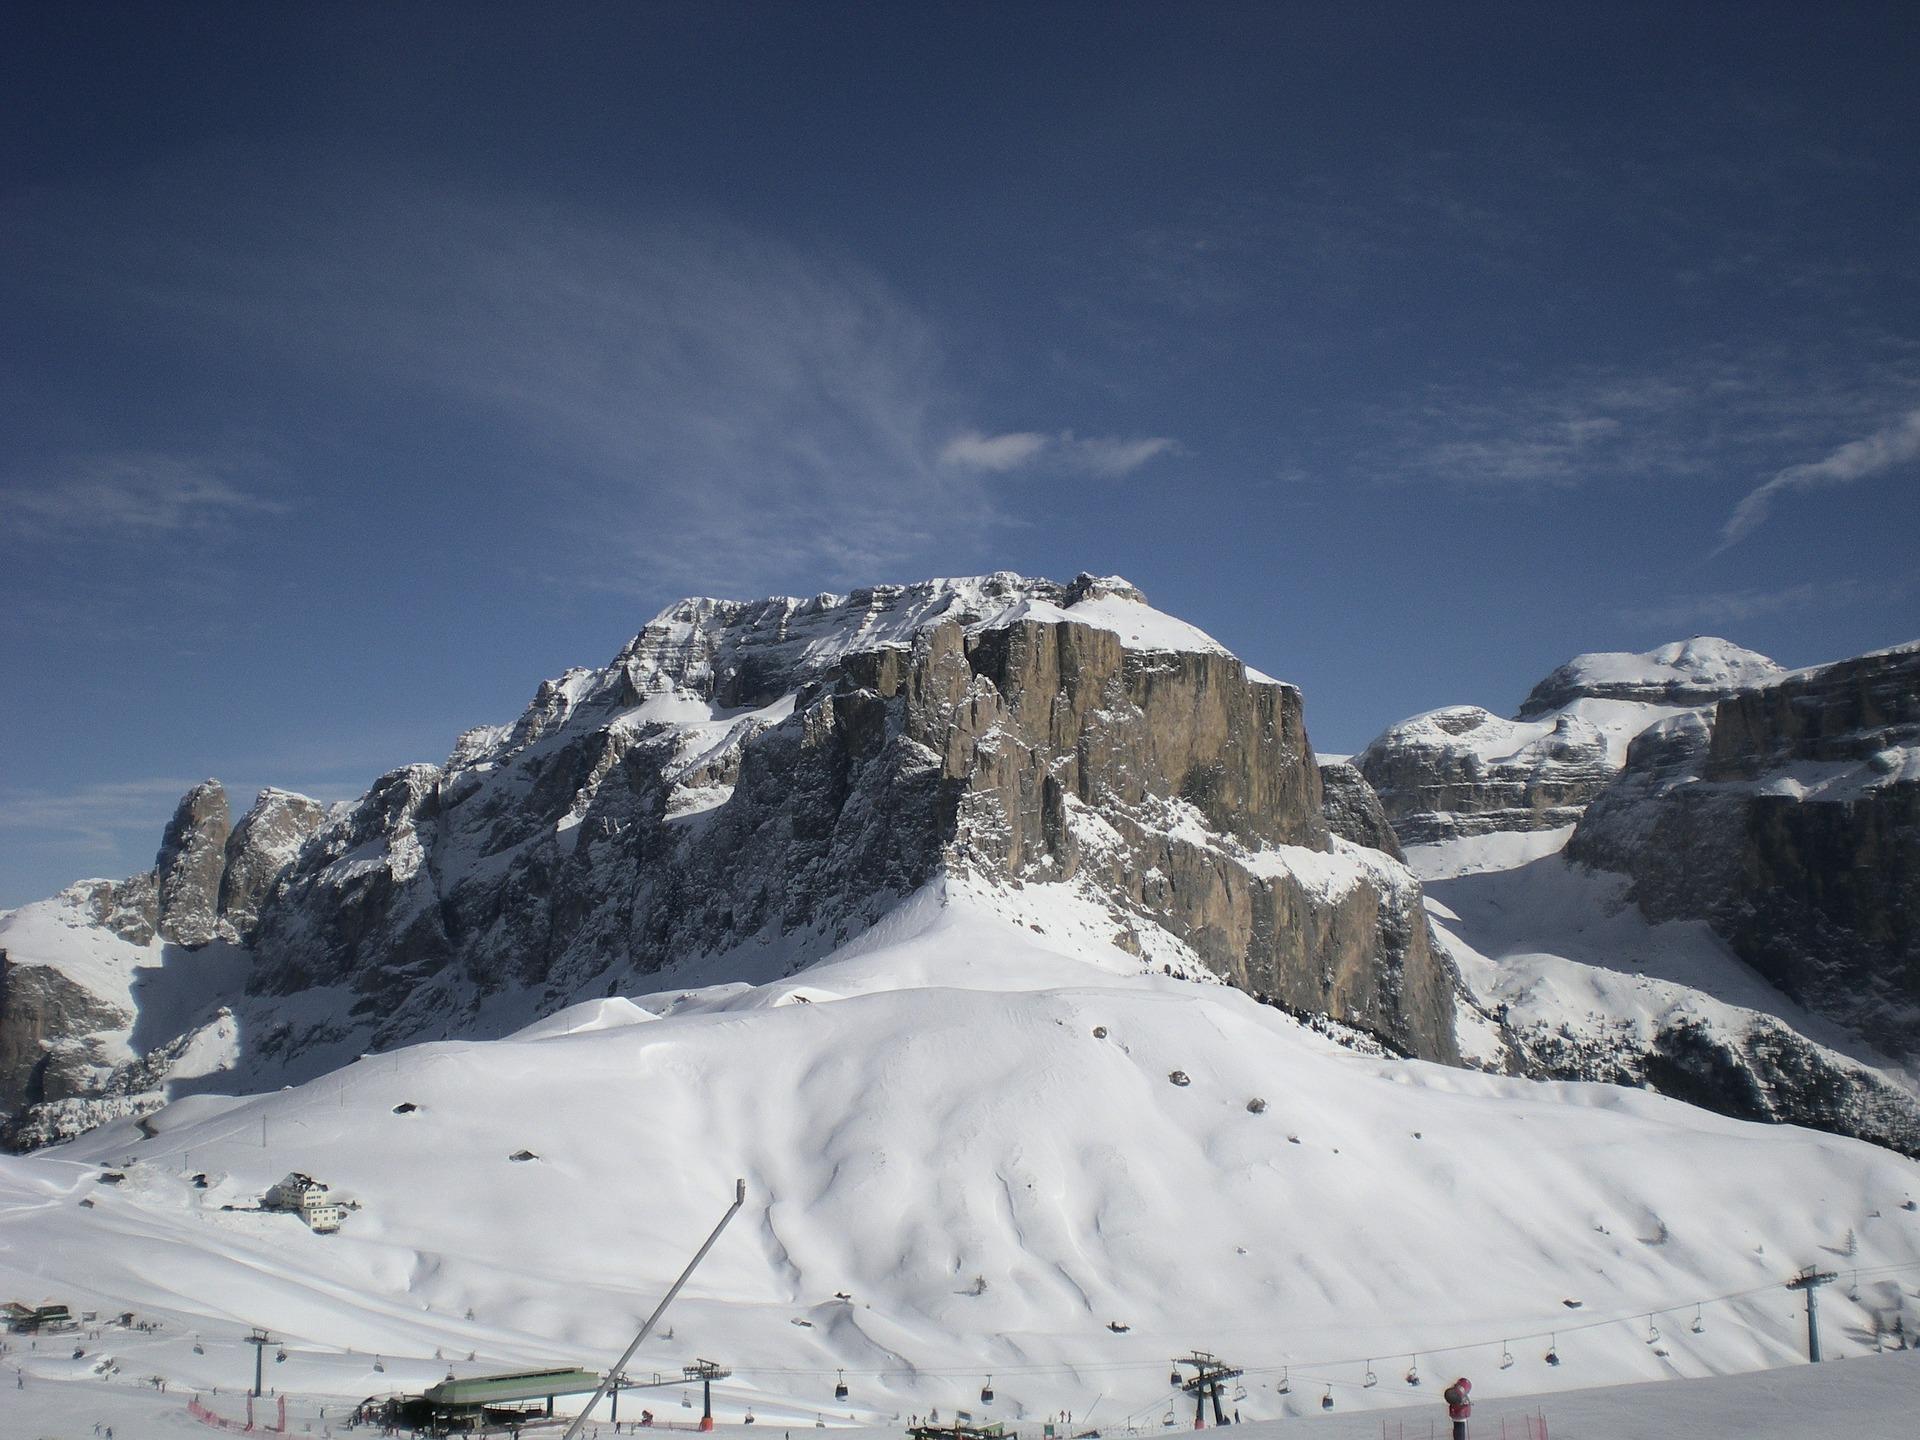 Indrukwekkend bergmassief bij Canazei in het skigebied Dolomiti Superski